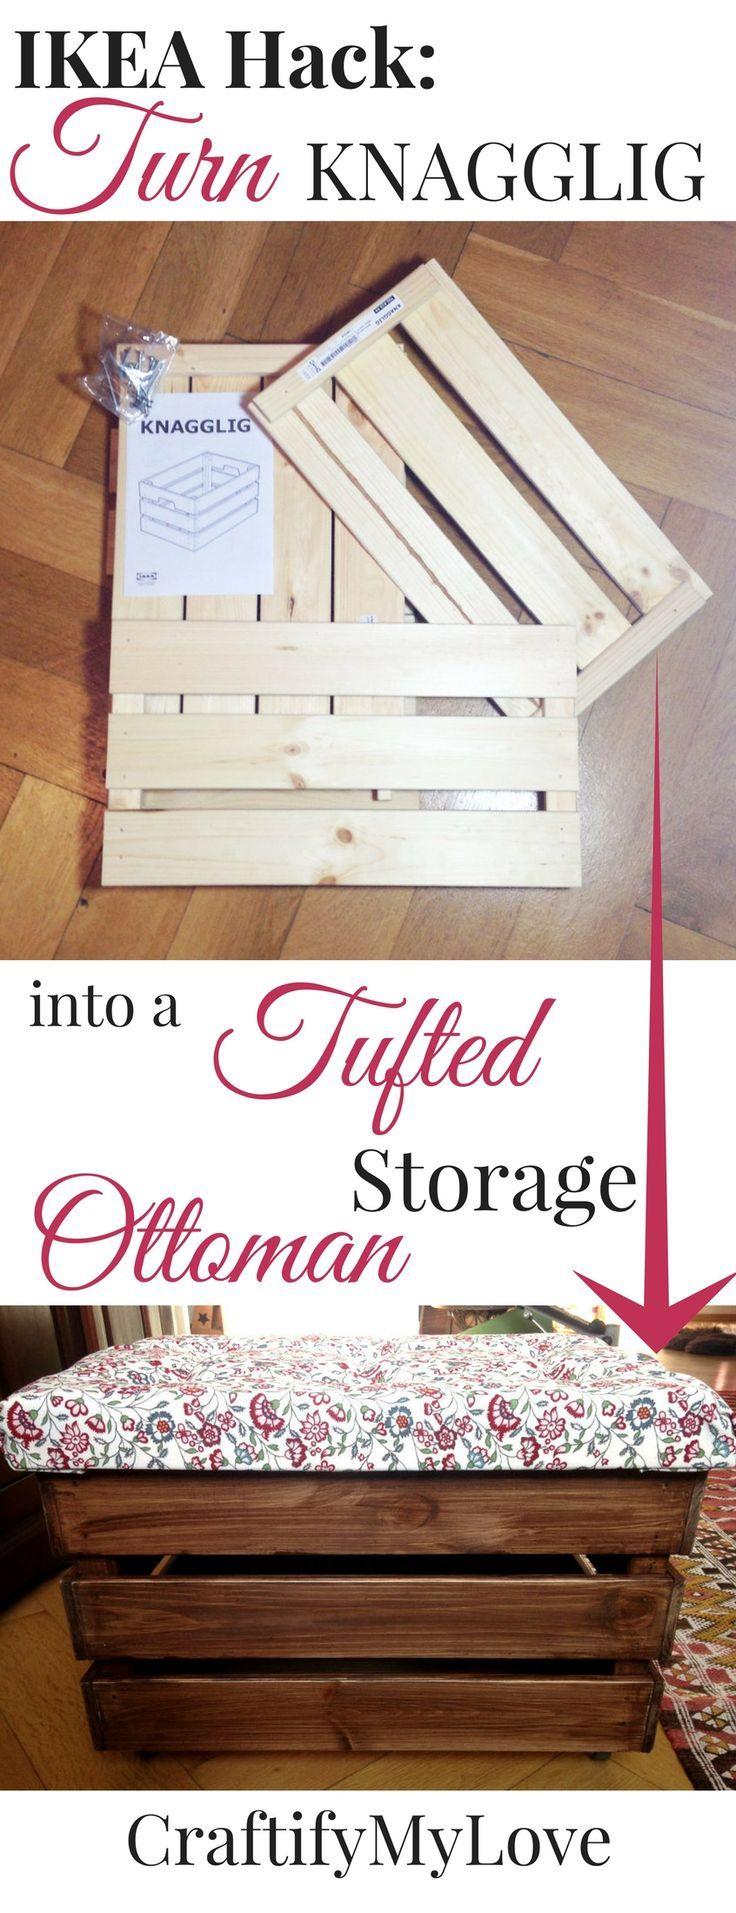 Photo of IKEA Hack – Tufted Storage Ottoman